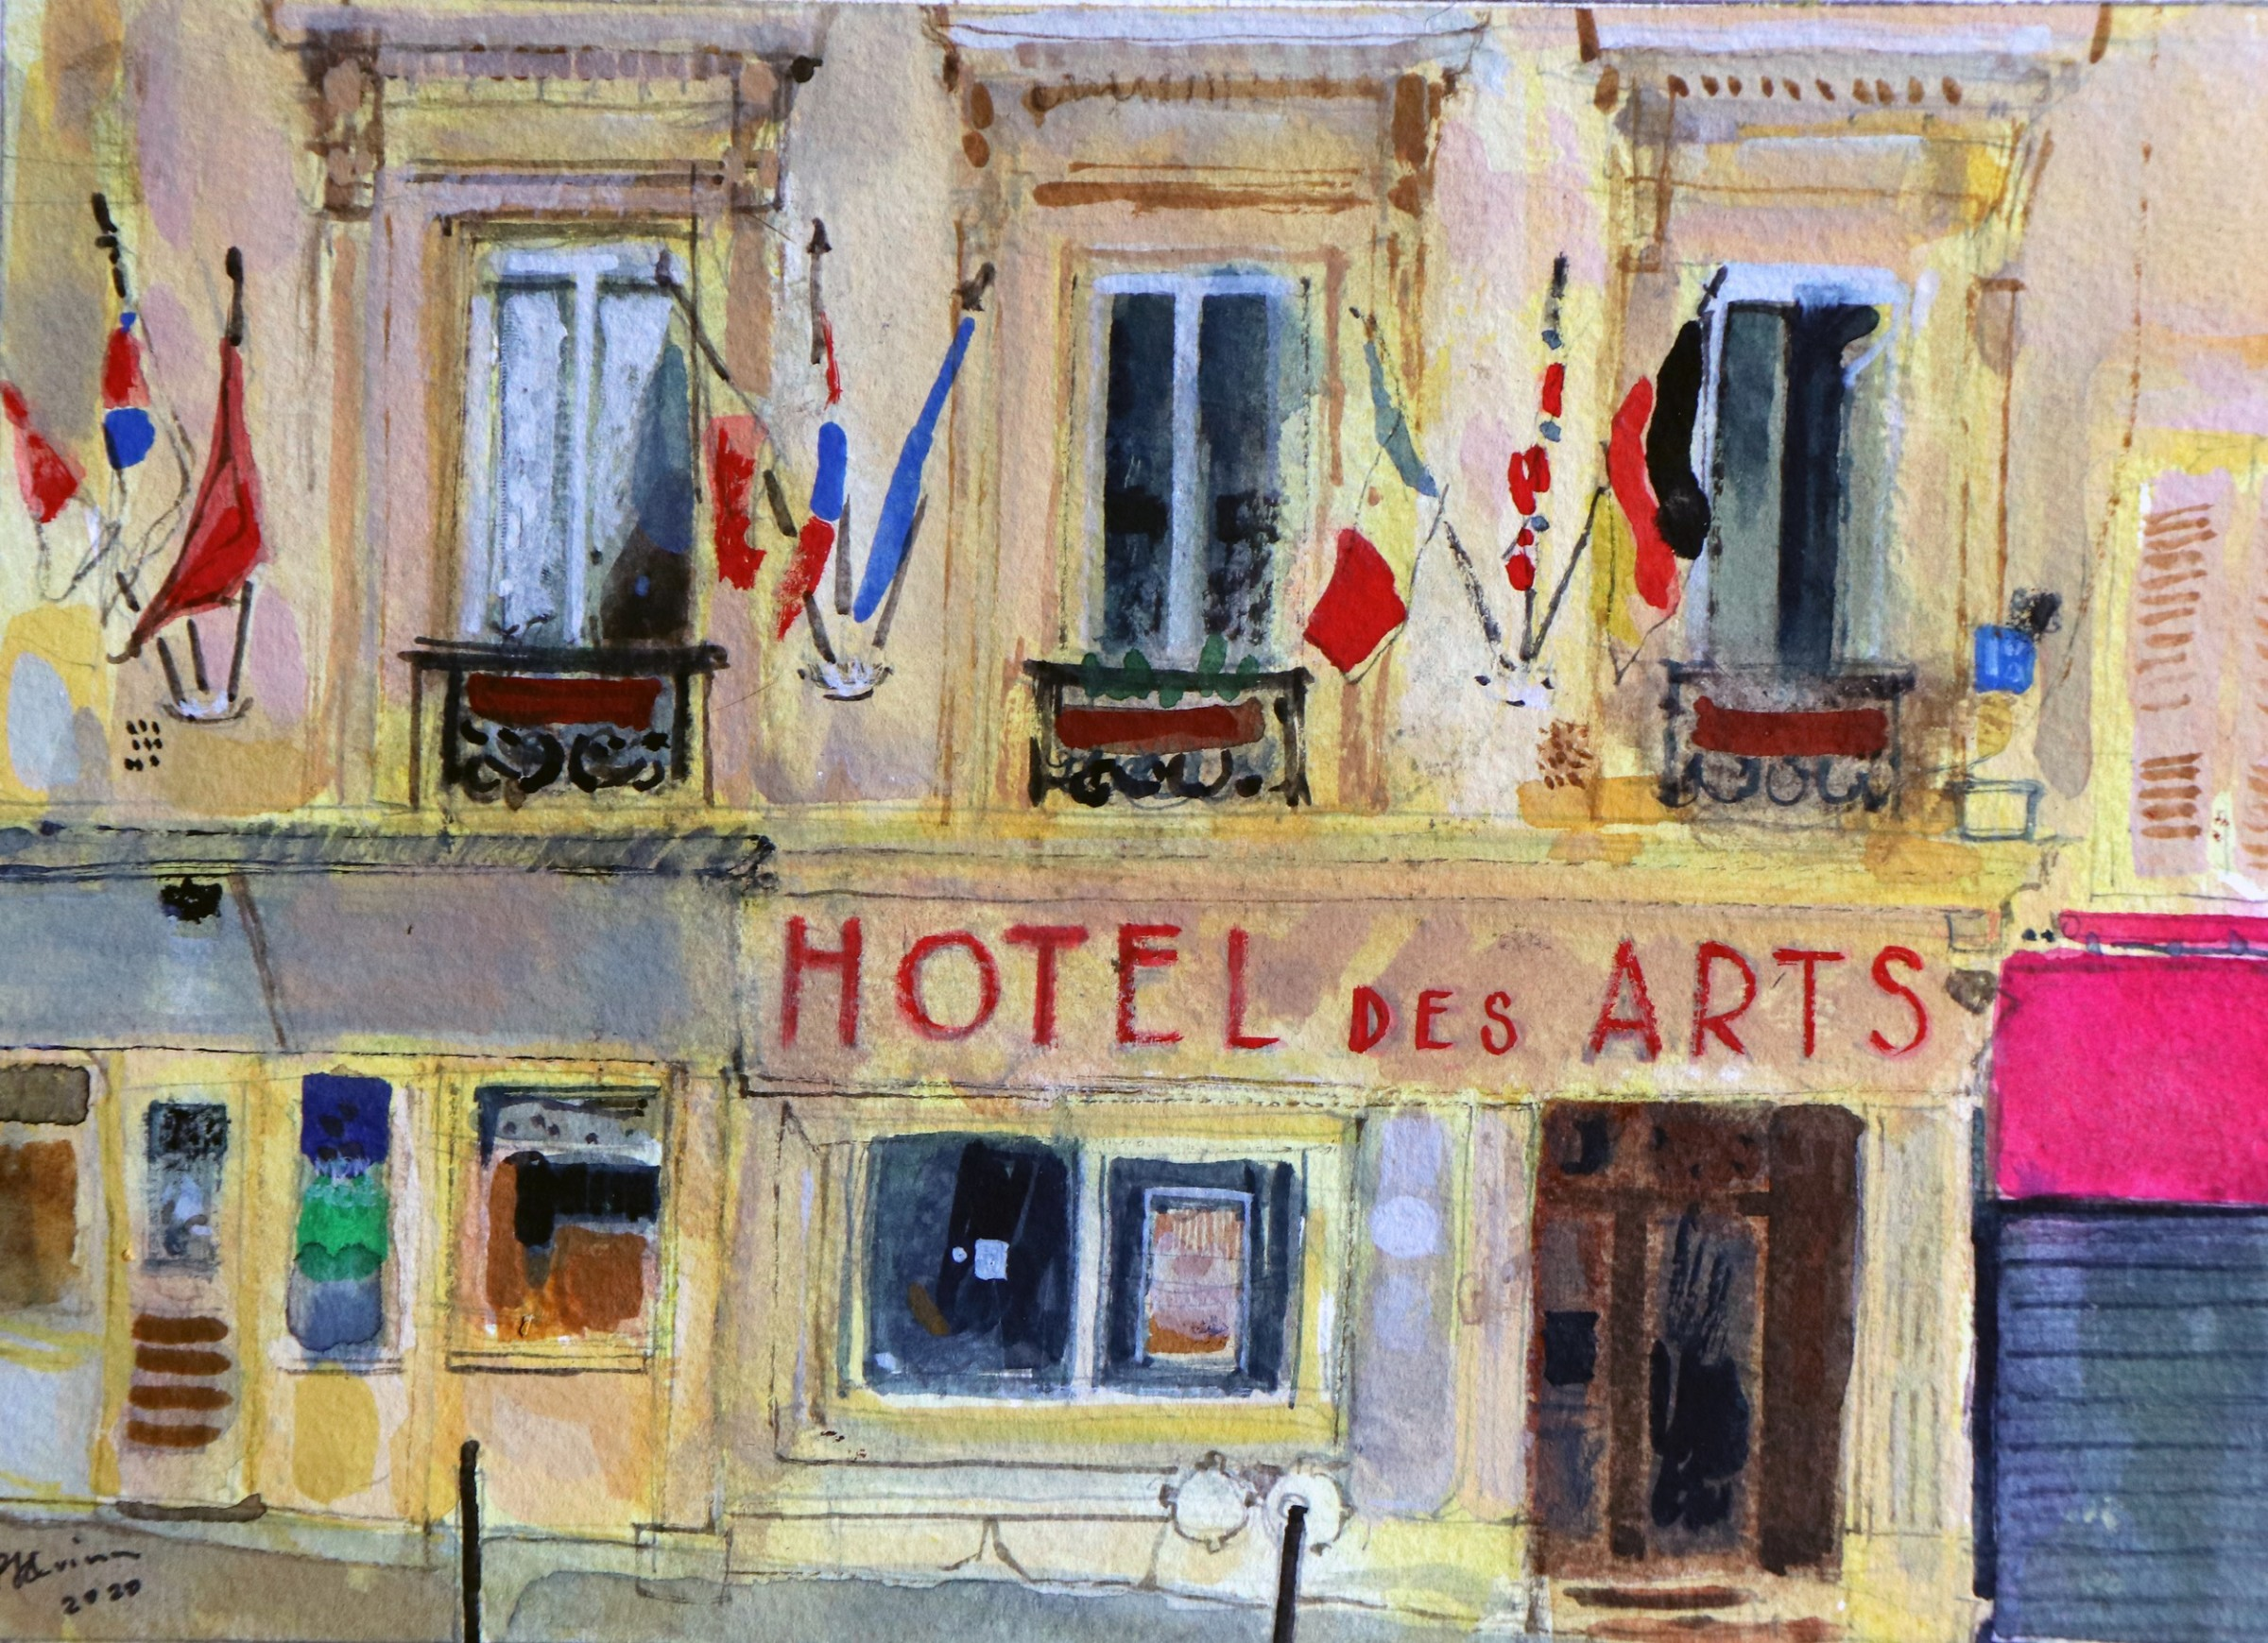 "<span class=""link fancybox-details-link""><a href=""/artists/96-peter-quinn/works/12294-peter-quinn-paris-hotel-des-arts/"">View Detail Page</a></span><div class=""artist""><span class=""artist""><strong>Peter Quinn</strong></span></div><div class=""title""><em>Paris, Hotel des Arts</em></div><div class=""medium"">watercolour on paper</div><div class=""dimensions"">Frame: 36 x 43 cm<br /> </div><div class=""price"">£450.00</div>"